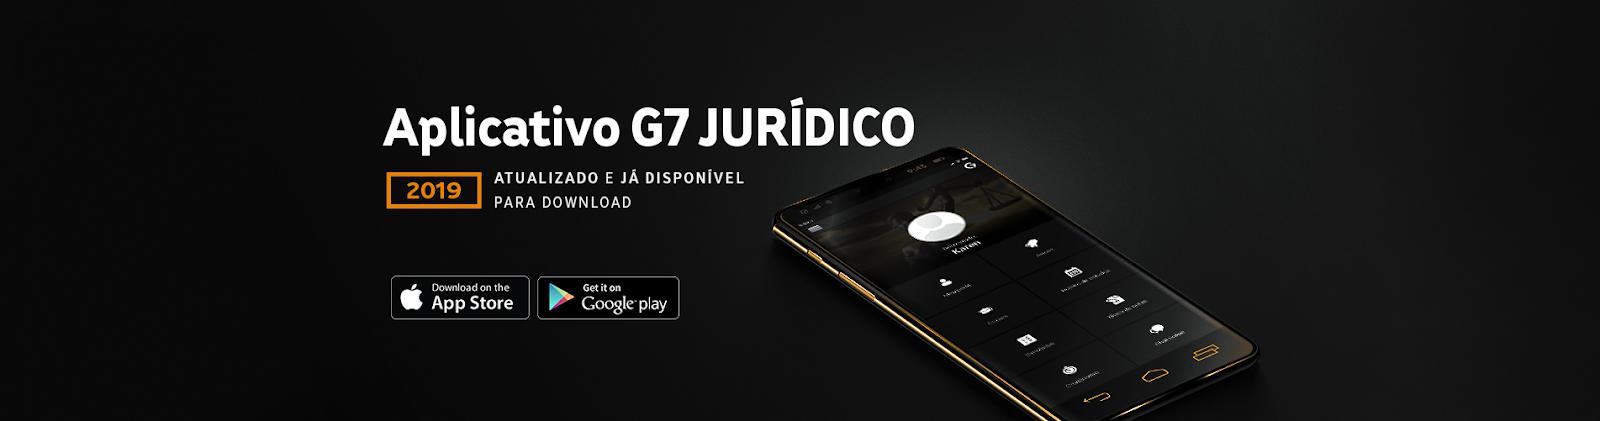 aplicativo g7